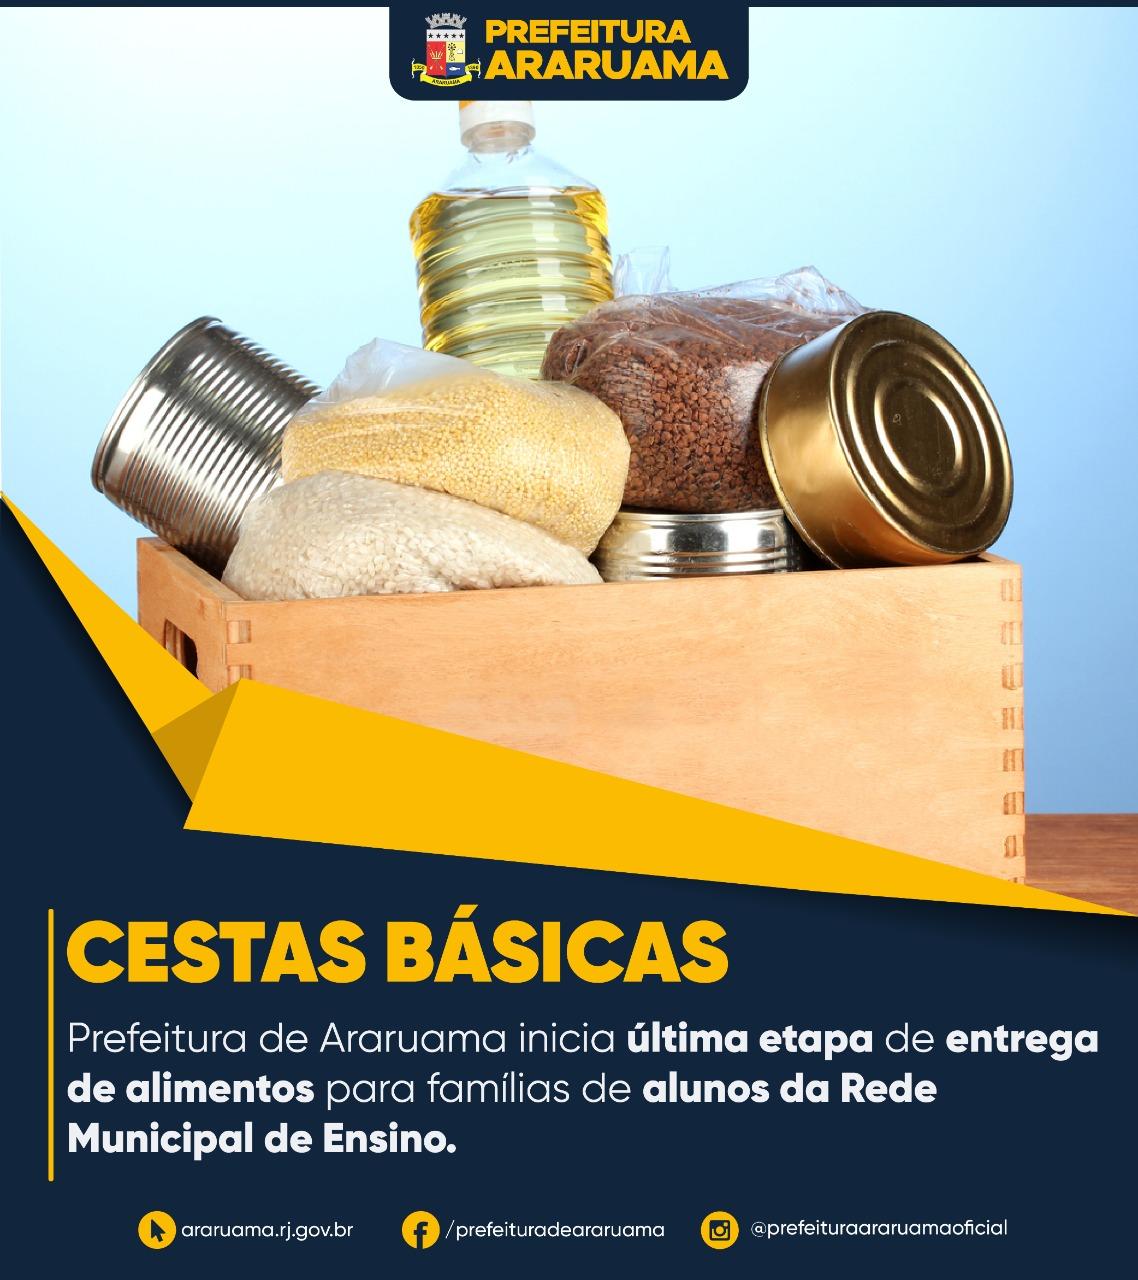 Prefeitura de Araruama vai realizar última etapa de entrega de cestas básicas para famílias de alunos da Rede Municipal de Ensino